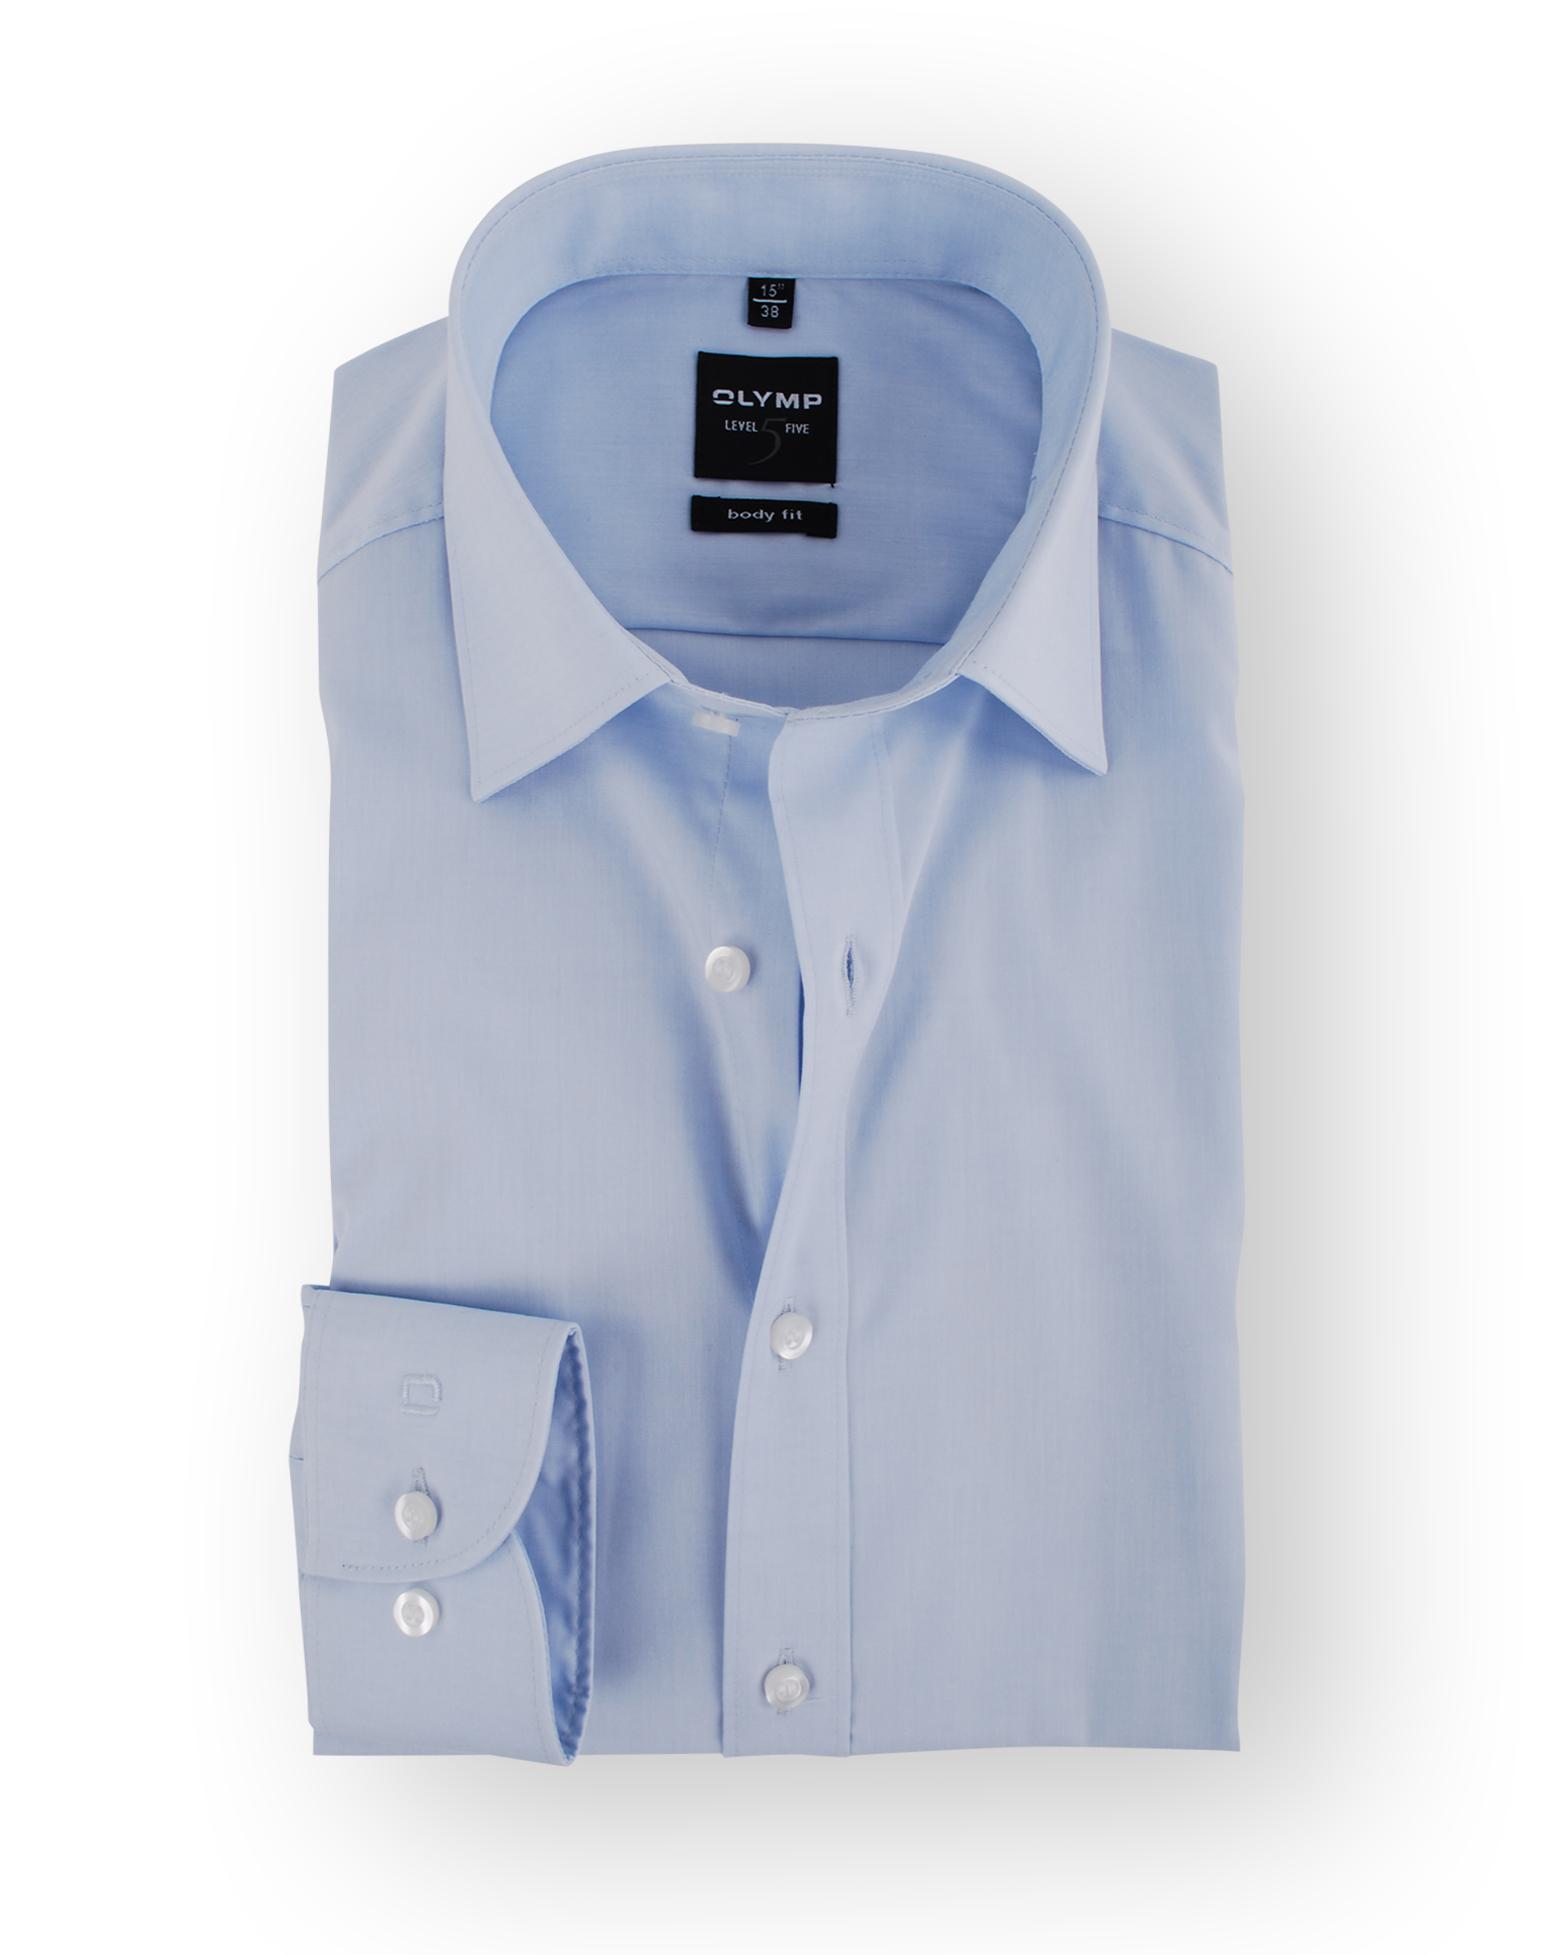 home olymp hemden olymp shirt light blue body fit. Black Bedroom Furniture Sets. Home Design Ideas